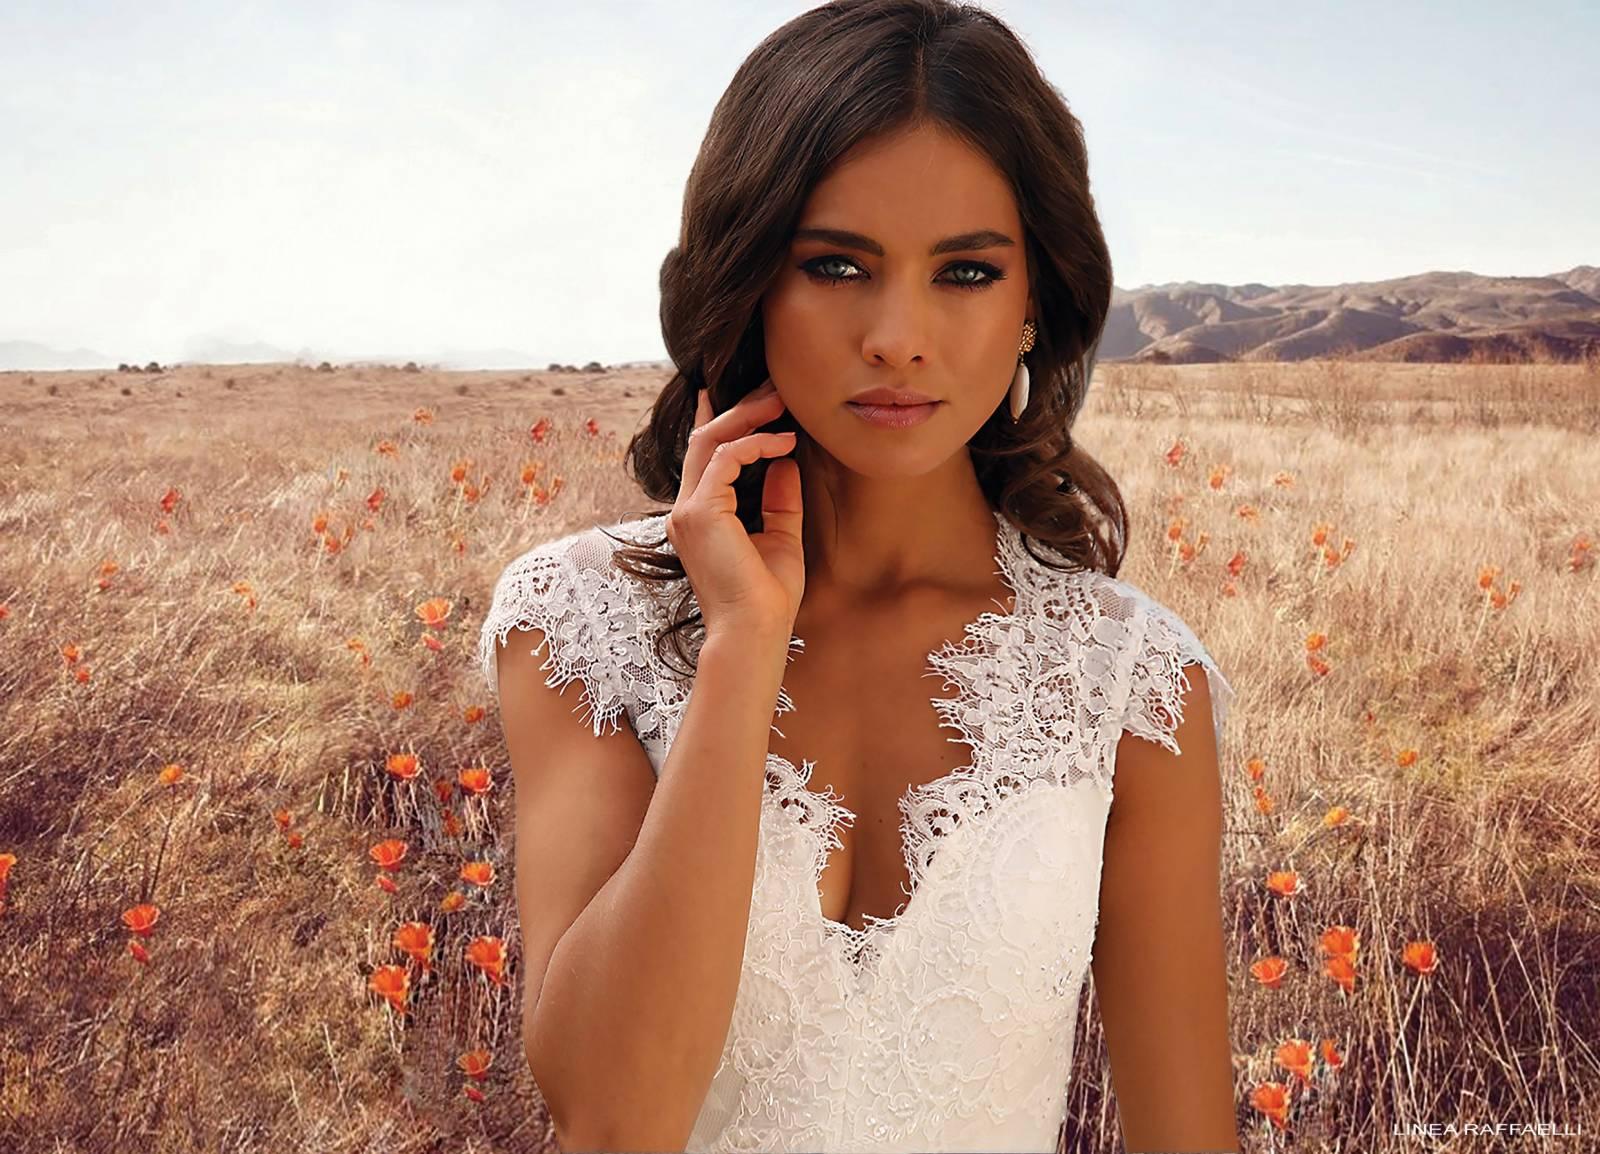 Cermo Concept - Bruidsmode winkel - Trouwjurk - Kostuum - House of Weddings - 5